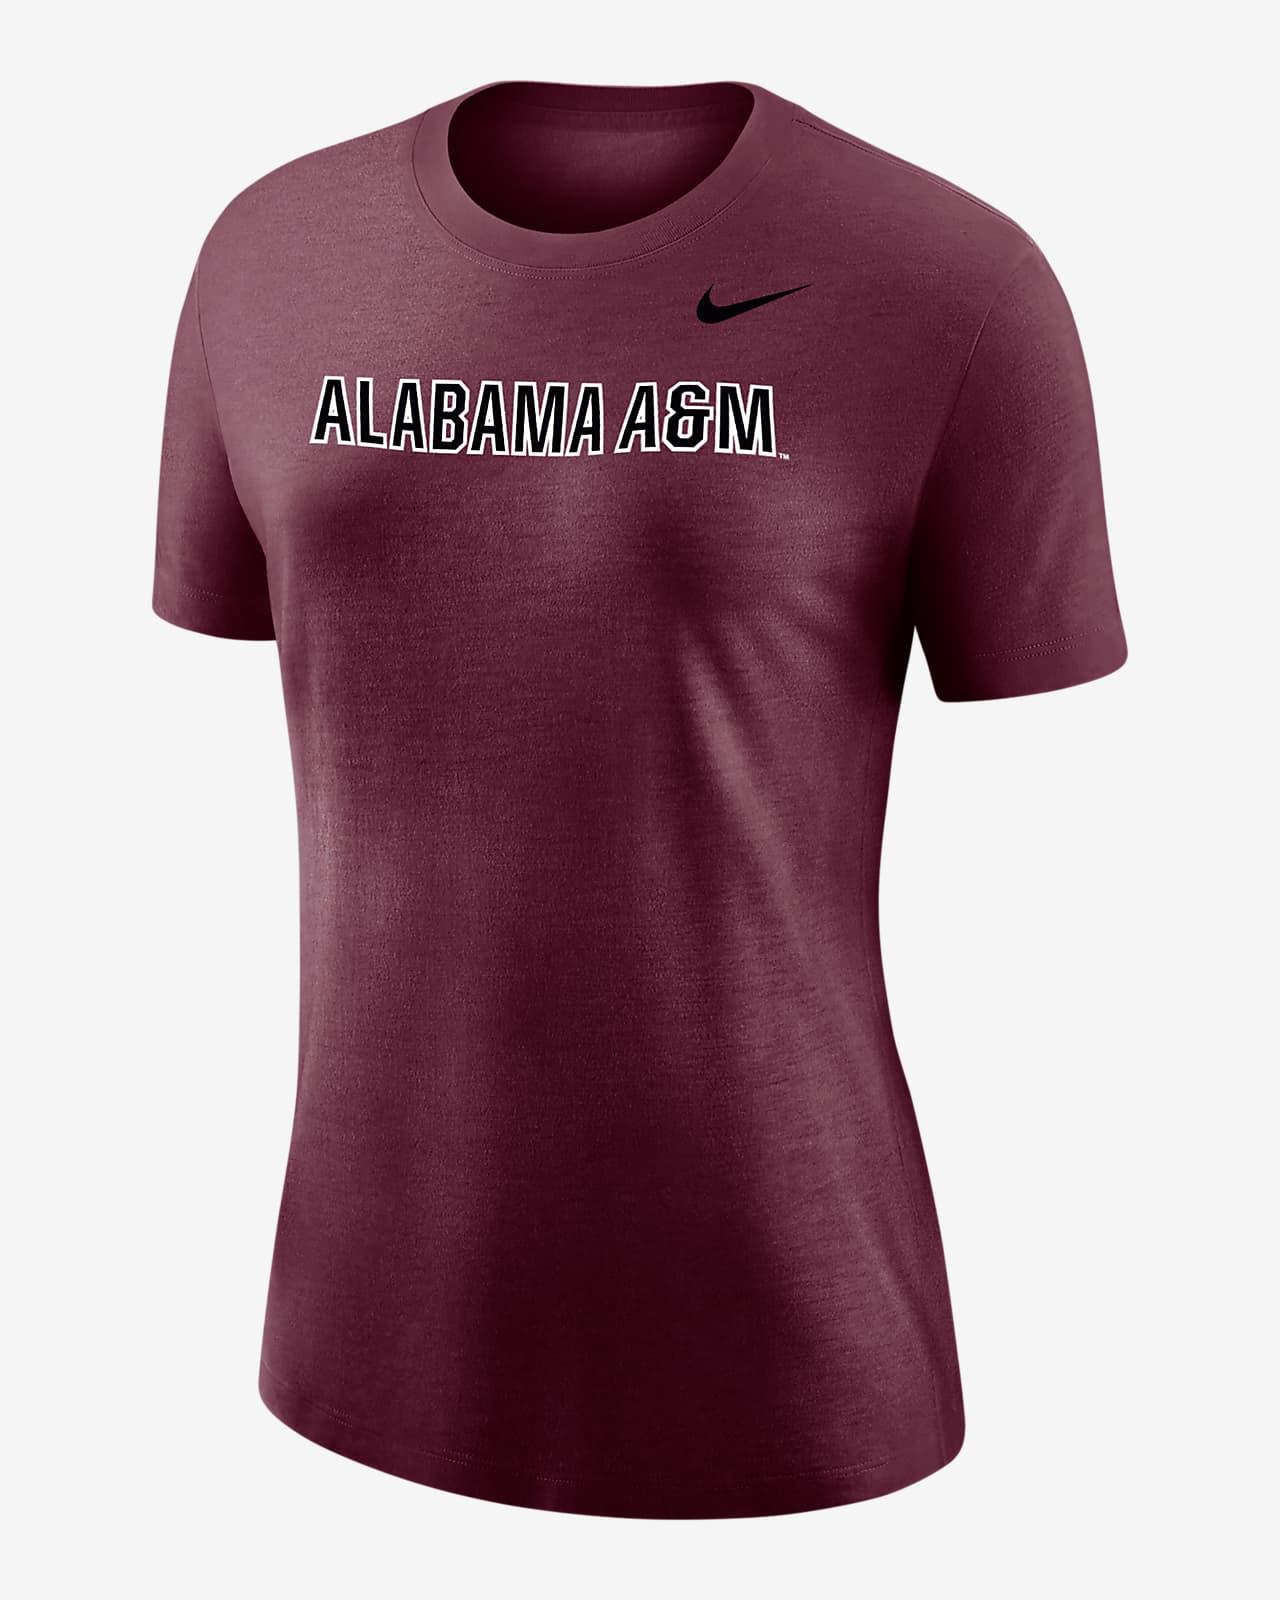 Nike College (Alabama A&M) Women's T-Shirt